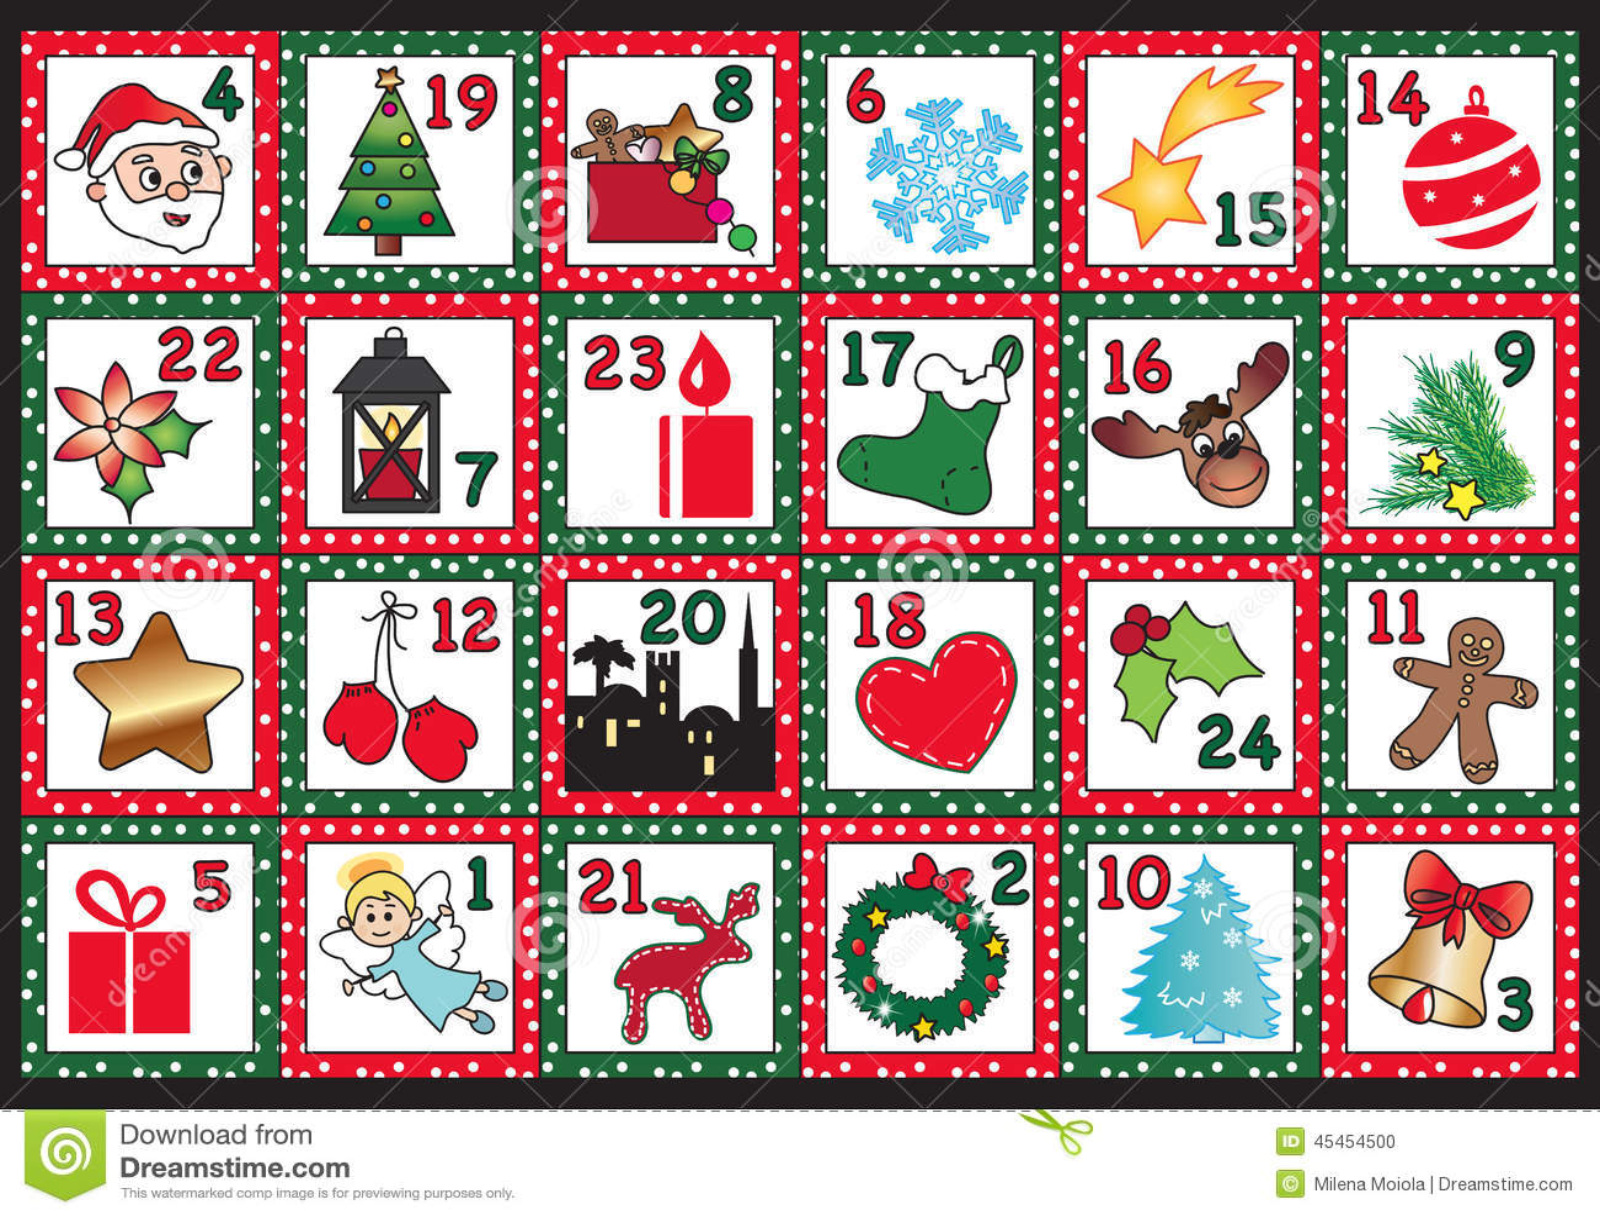 Advent Calendar Stock Illustration - Image: 45454500